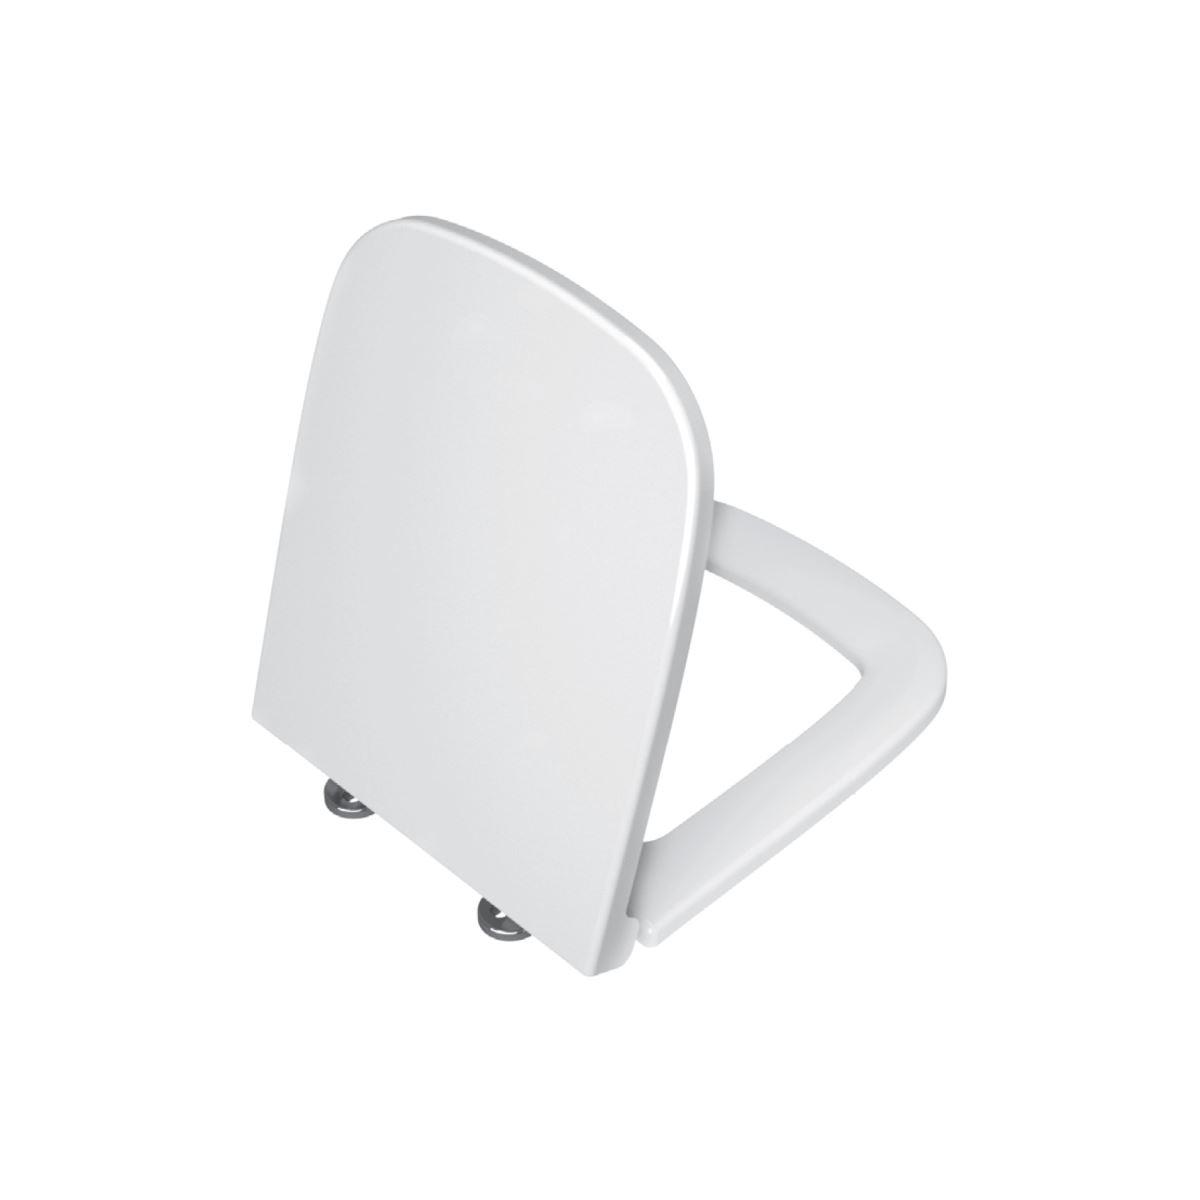 Square Toilet Seats